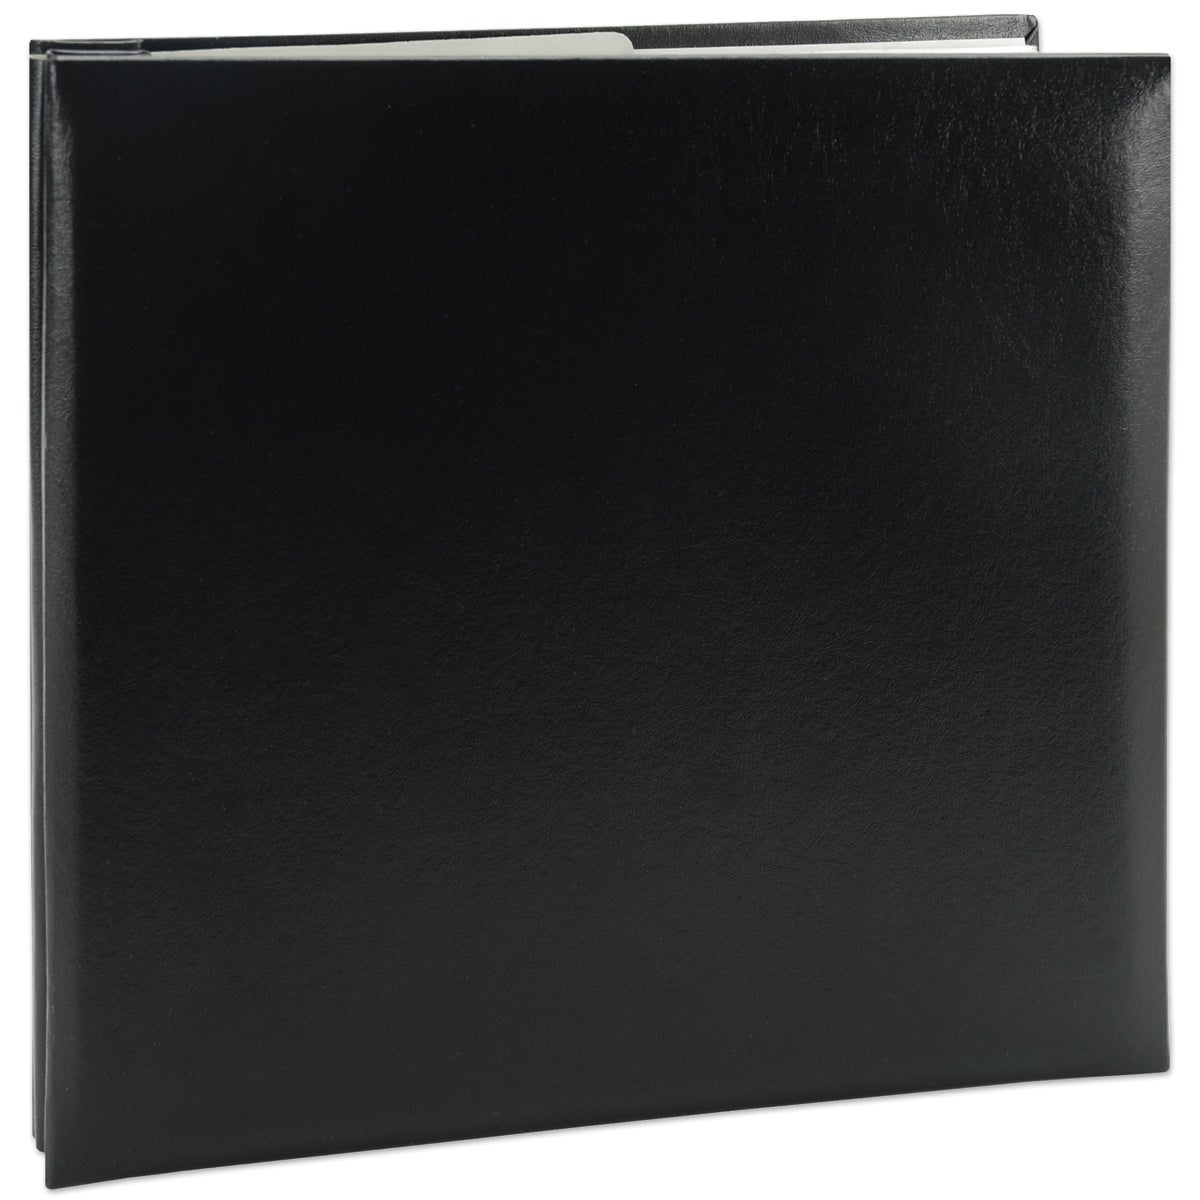 Pioneer Leatherette Post Bound Album 8inX8inBlack (Black)...